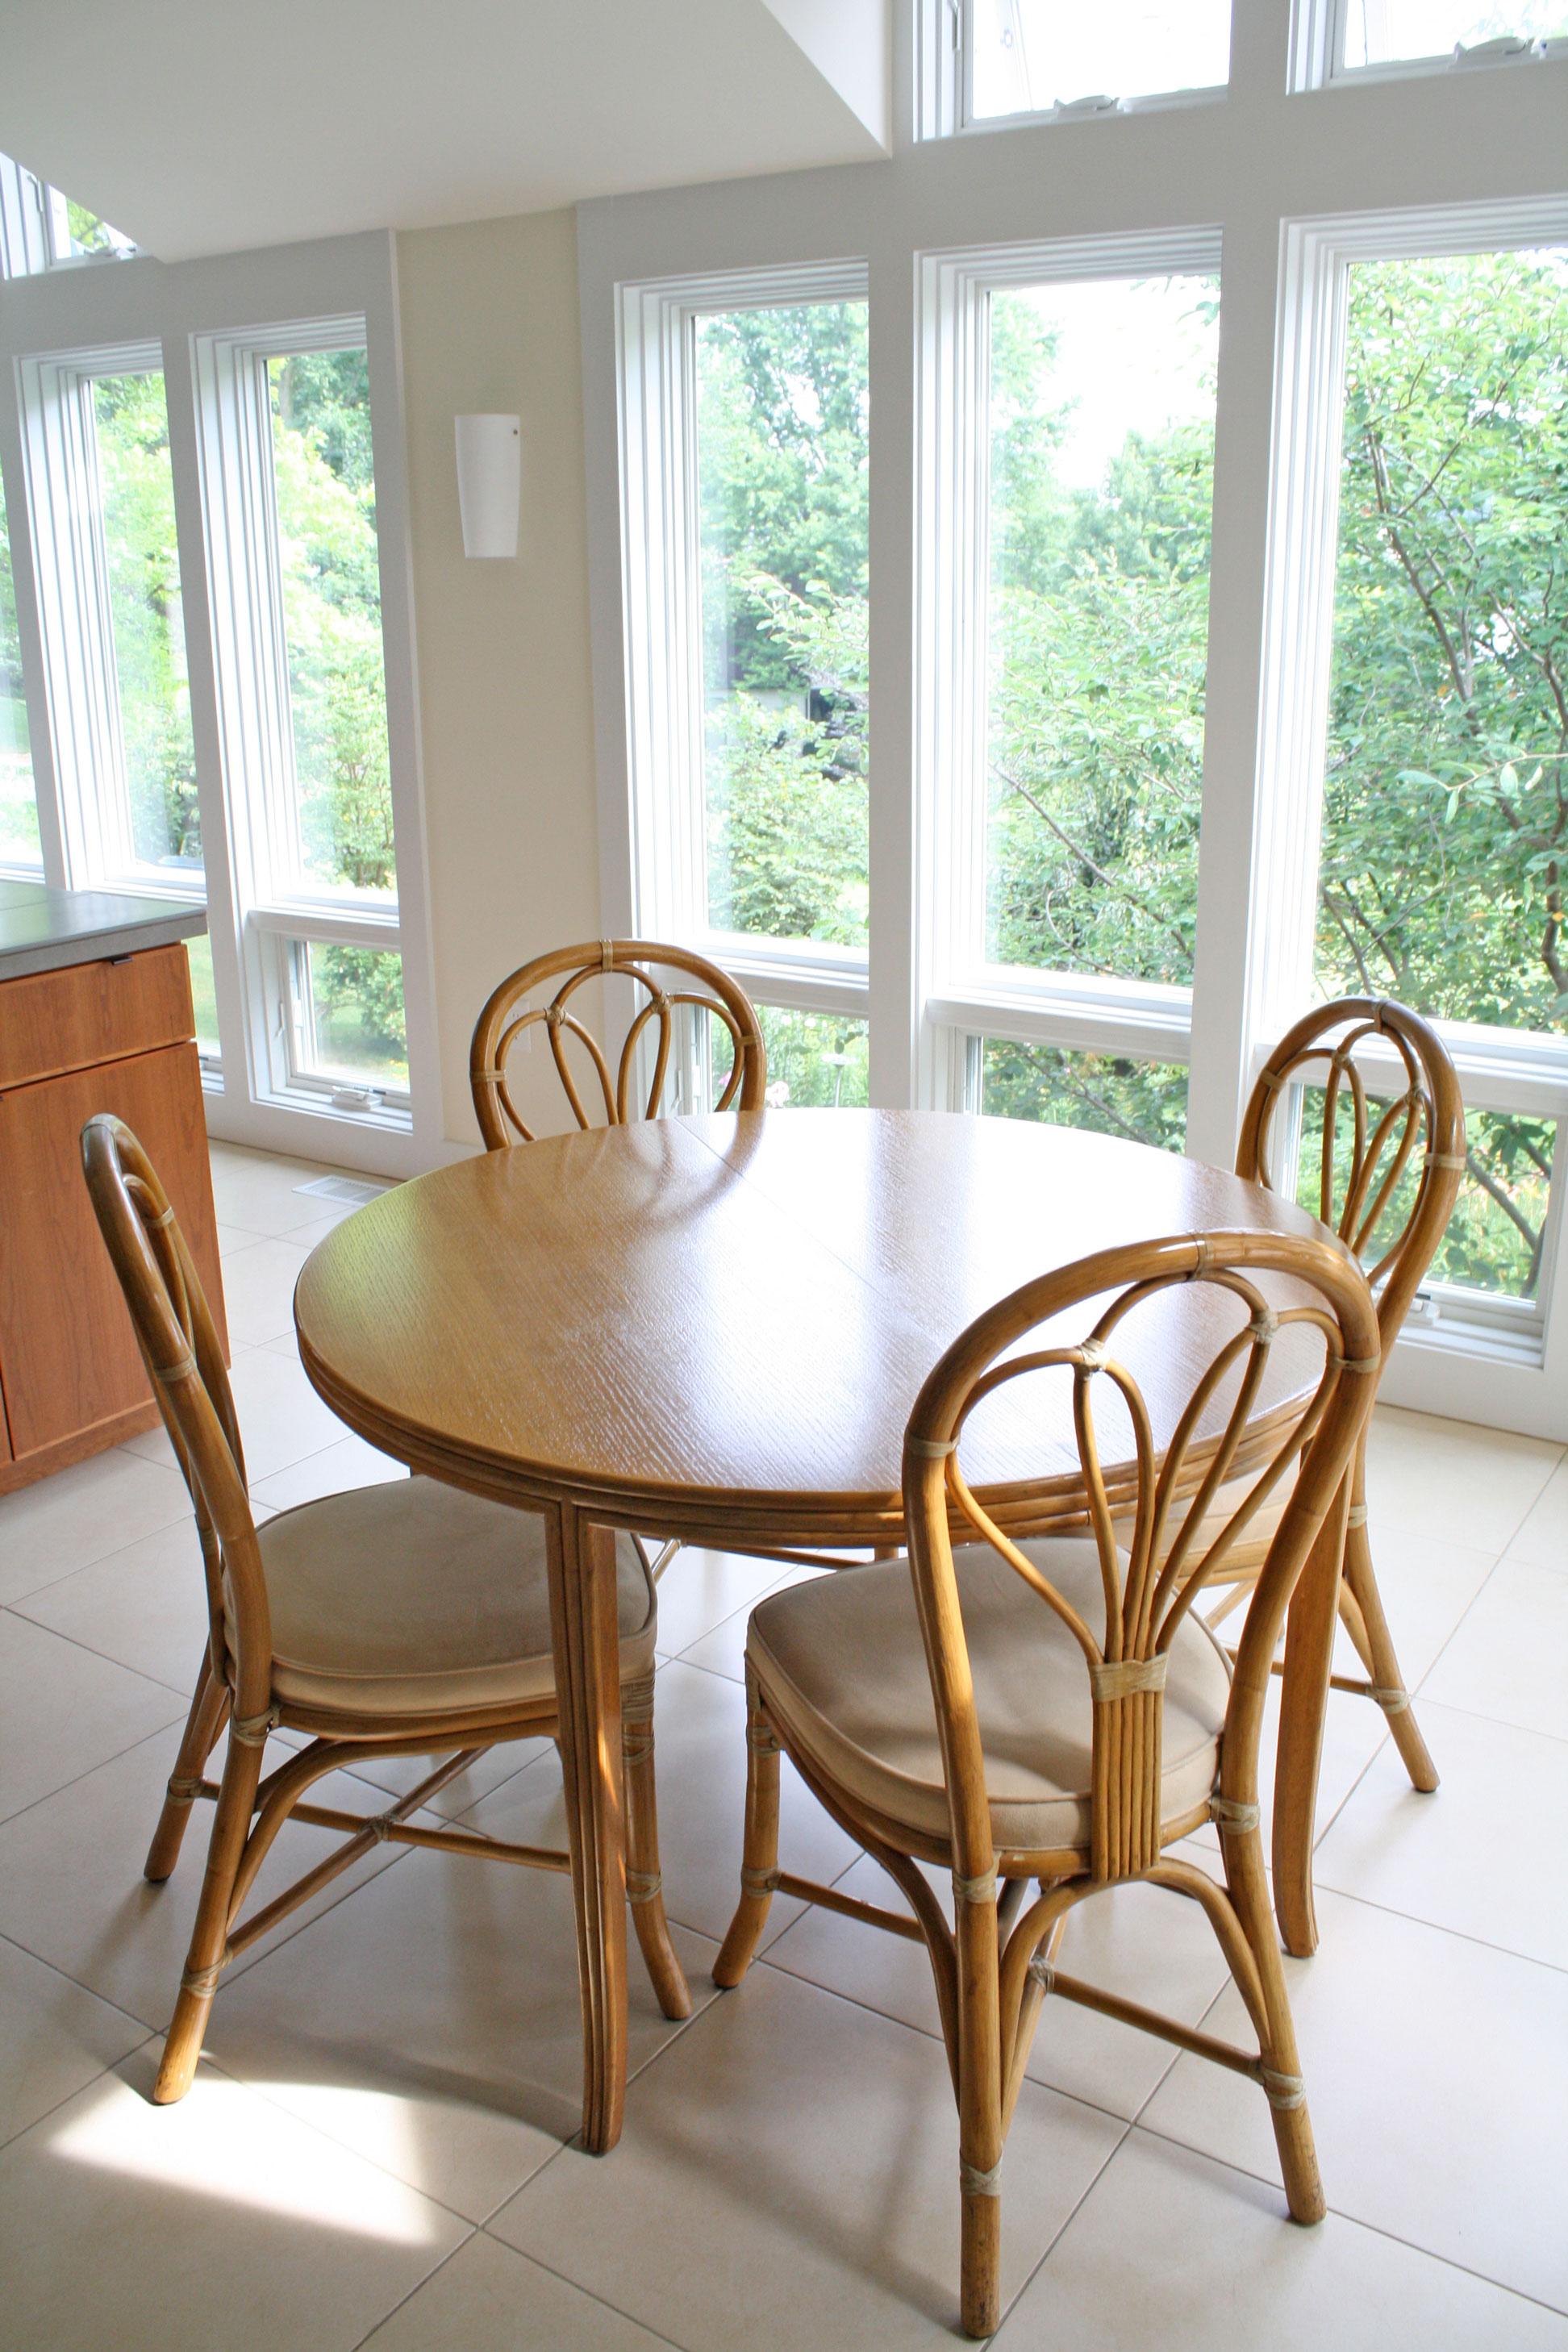 dining-area-large-windows.jpg